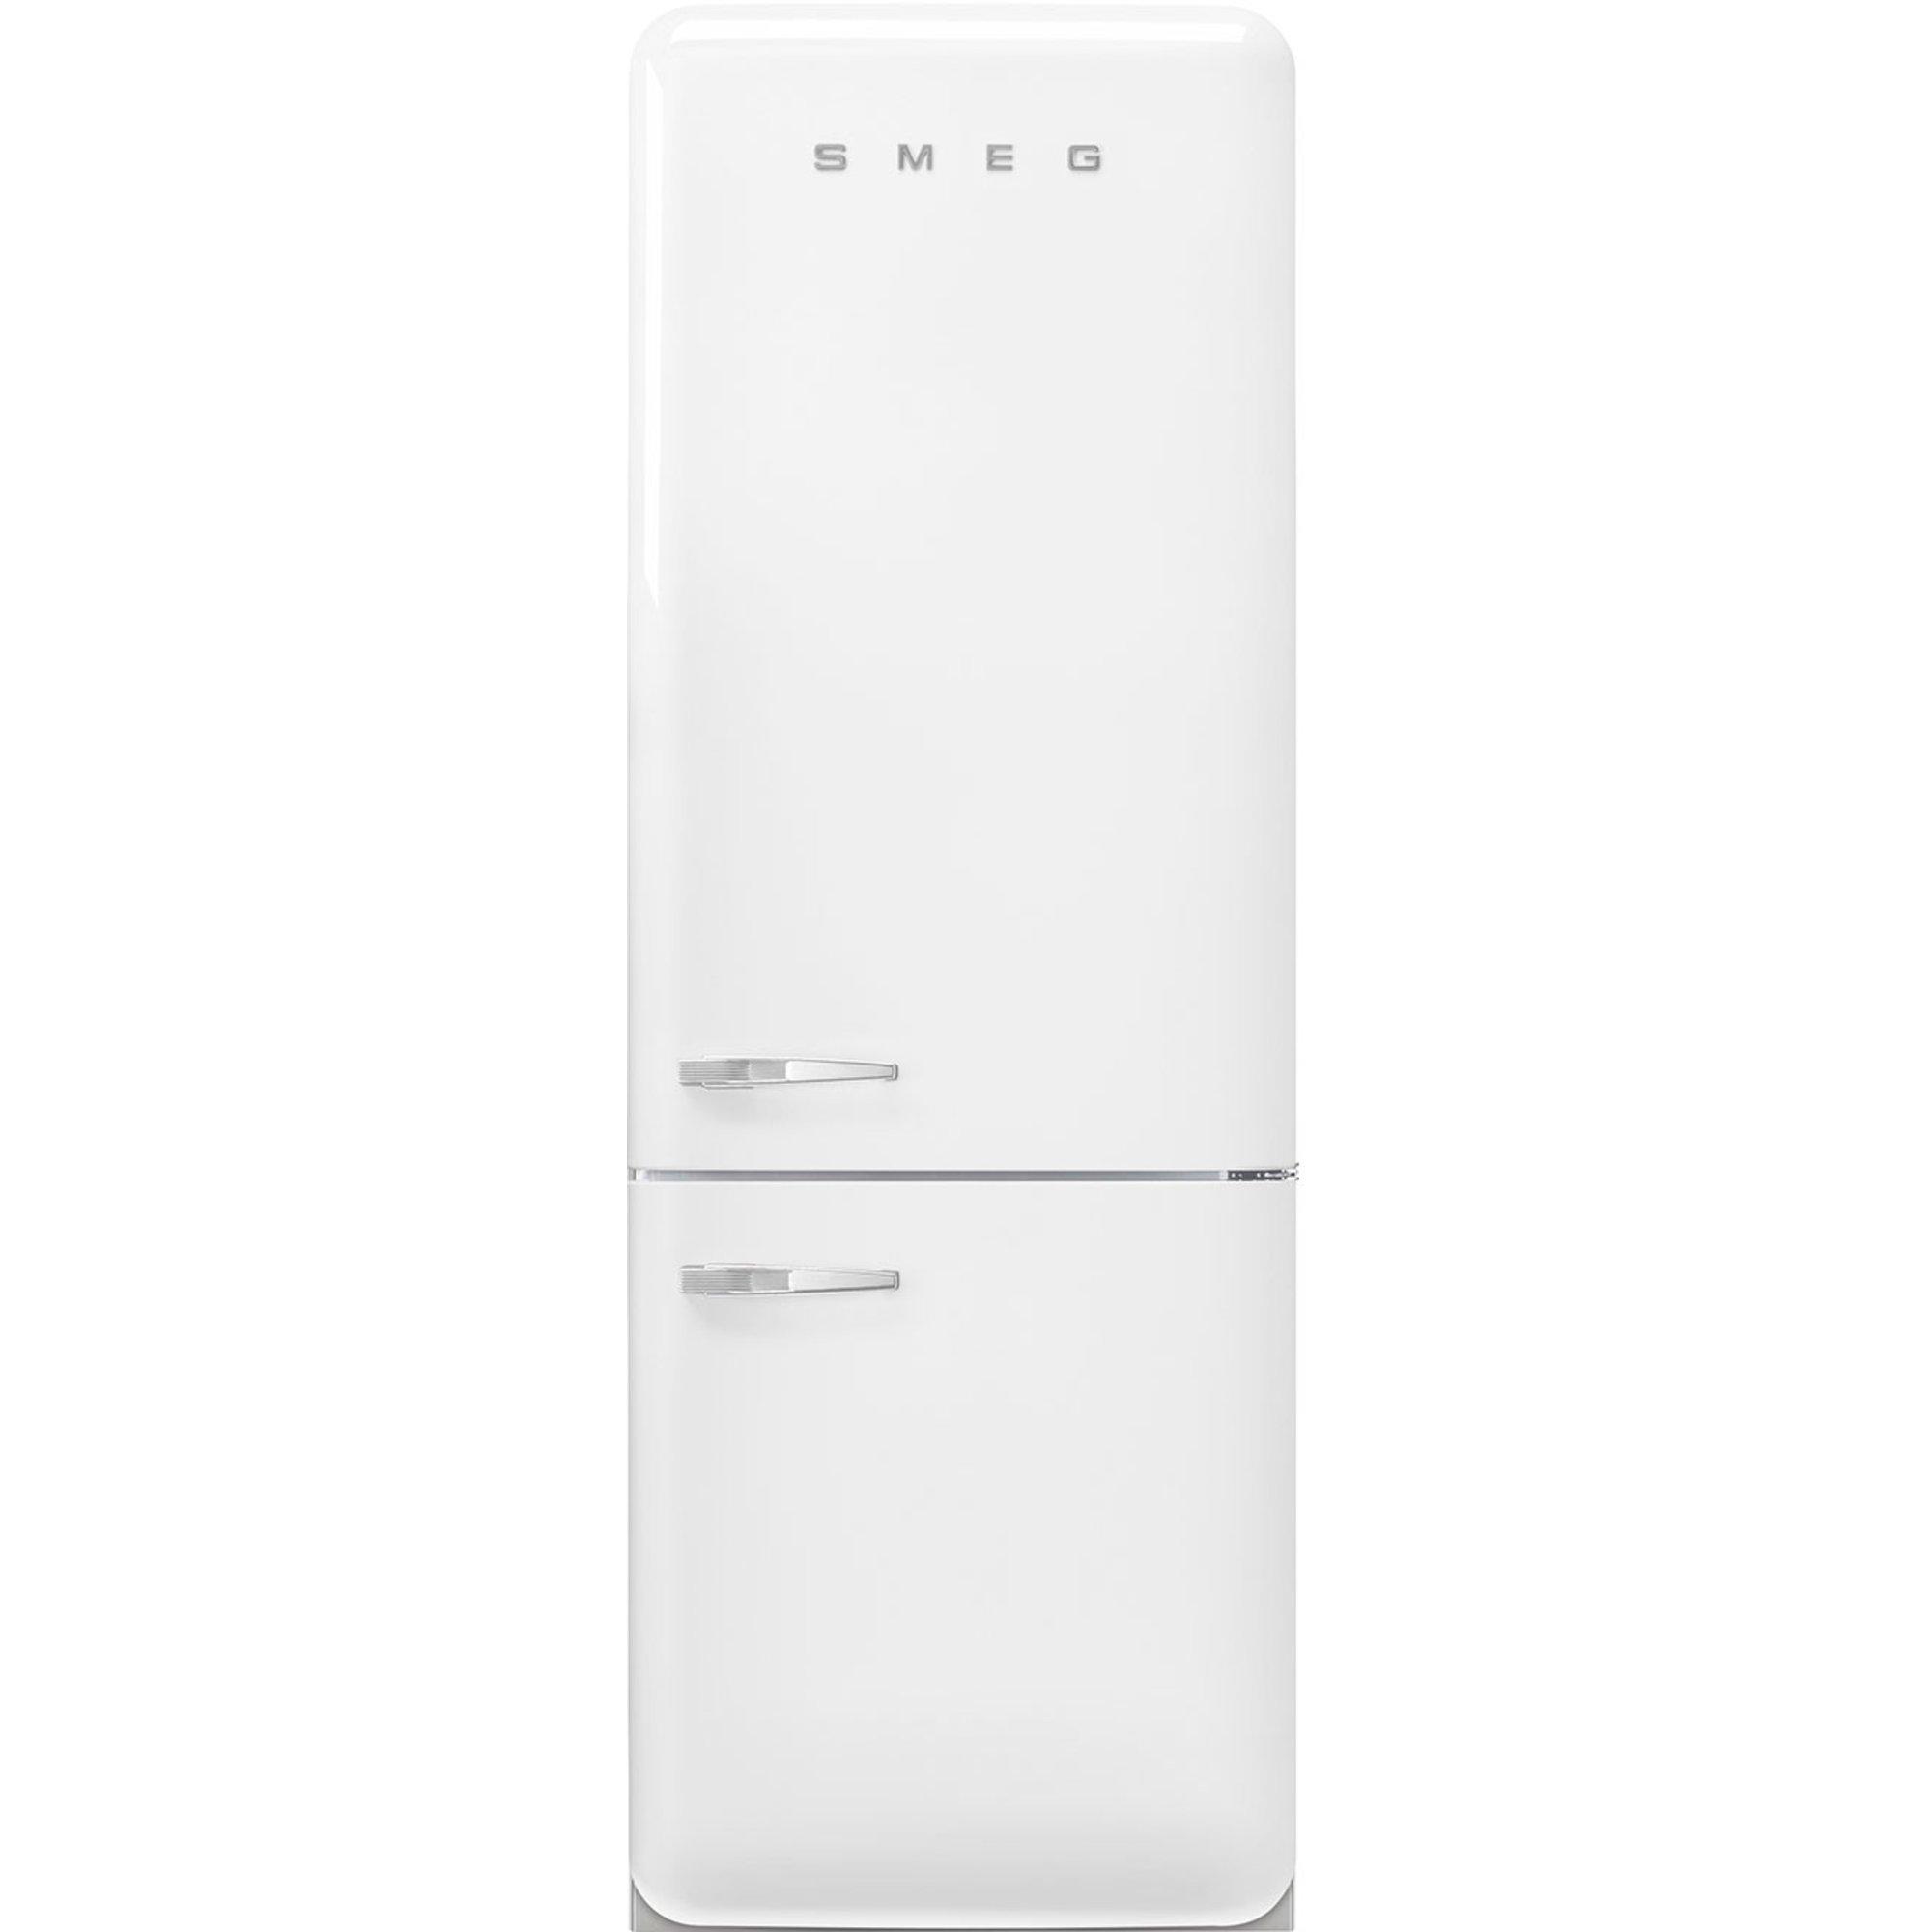 Smeg FAB38RWH5 køle-/fryseskab, hvid